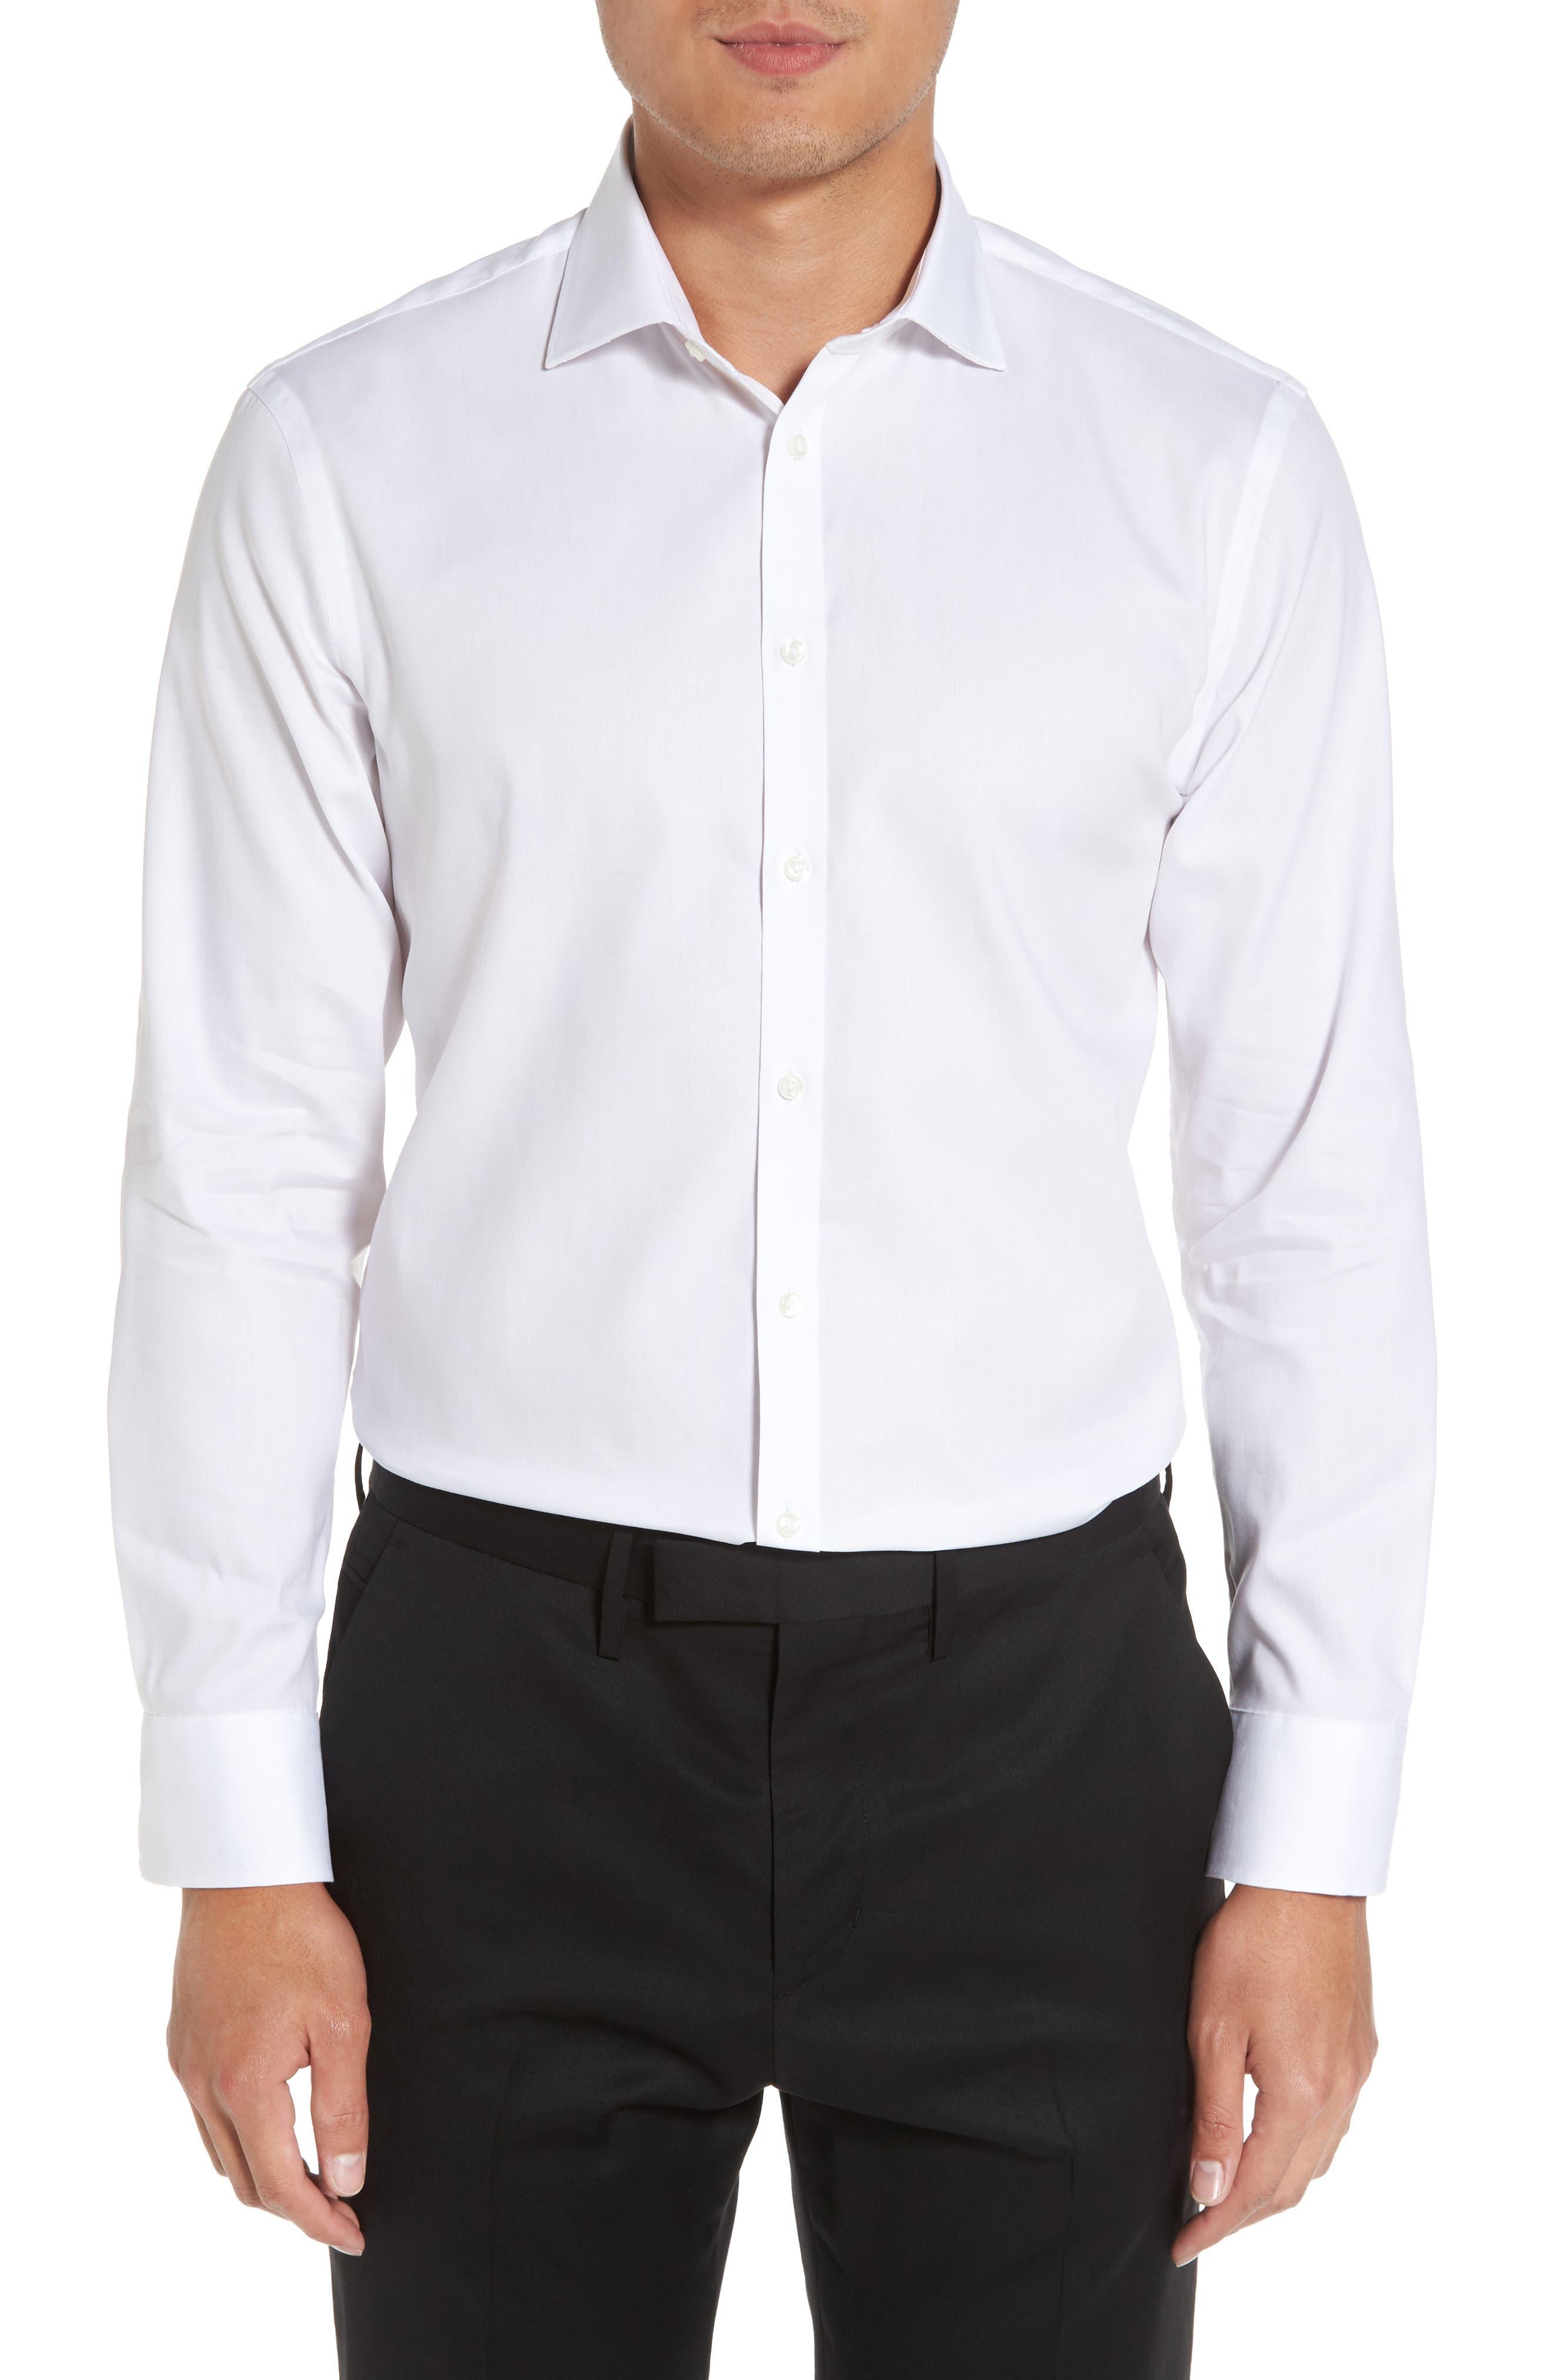 Main Image - Nordstrom Men's Shop Extra Trim Fit Non-Iron Solid Dress Shirt